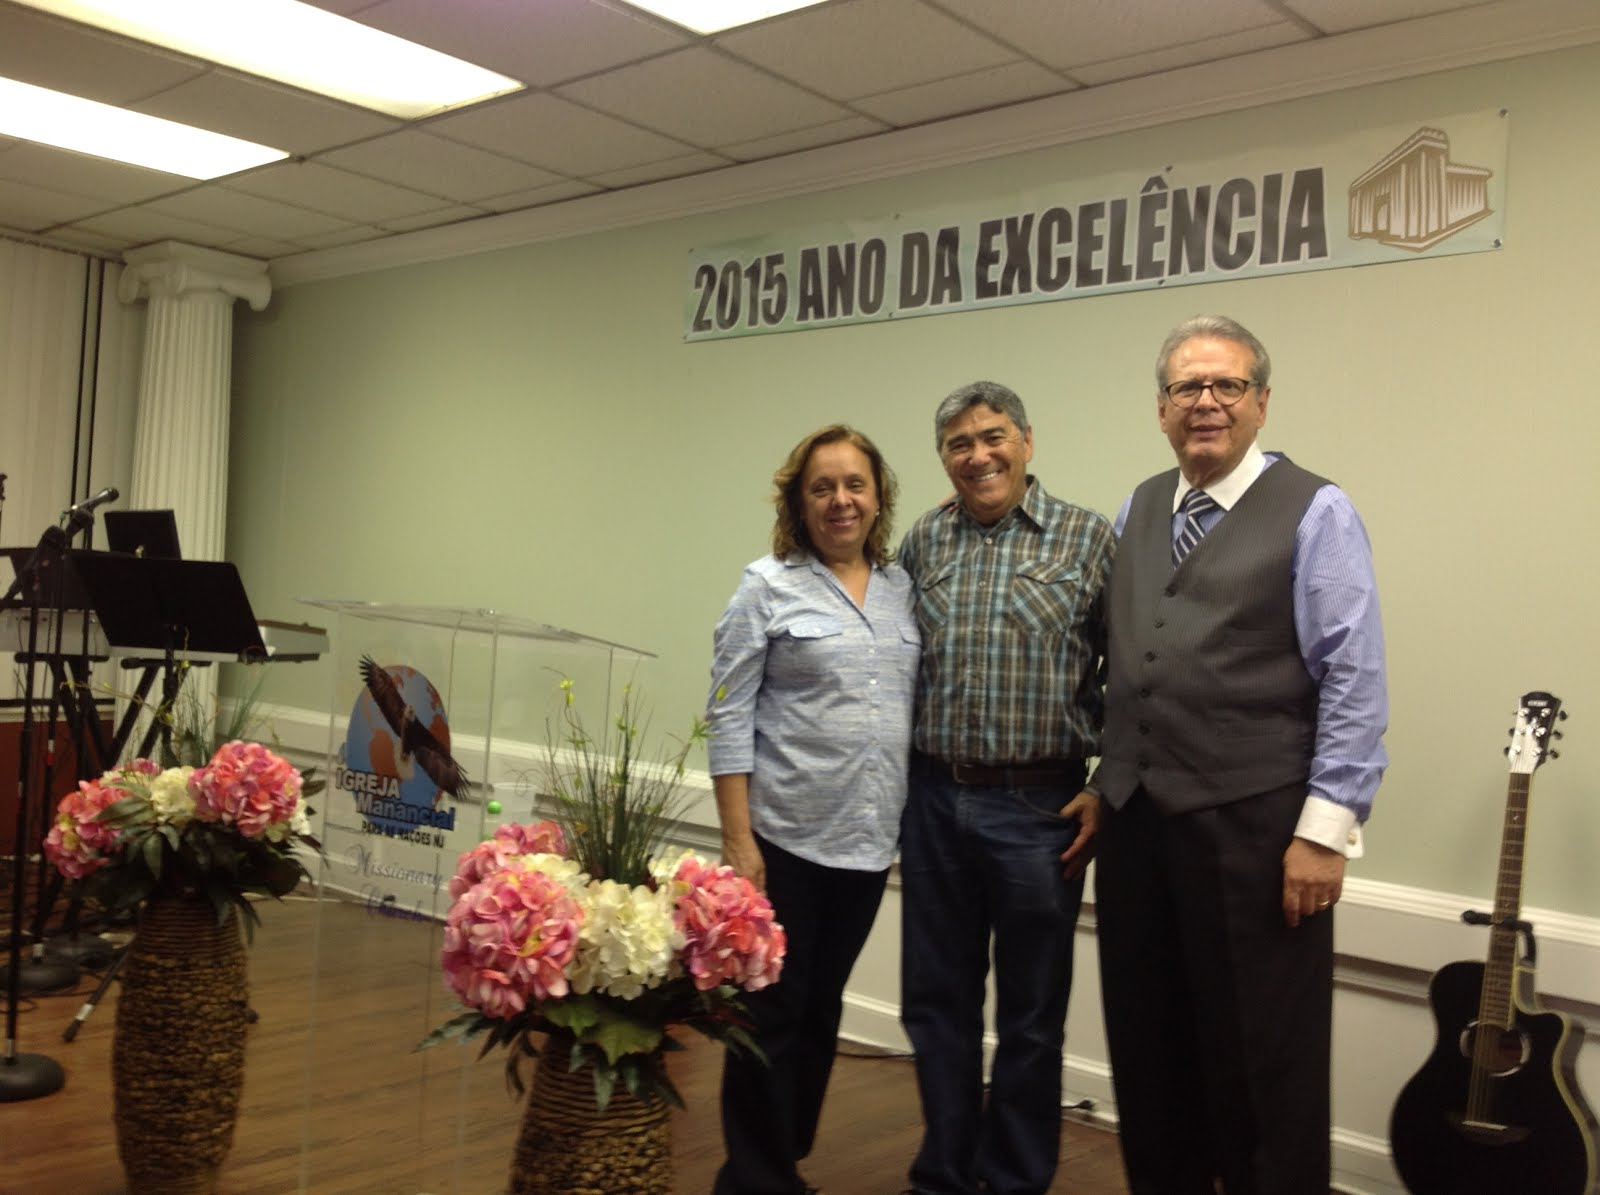 Pastores Sergio e Pastora Solange